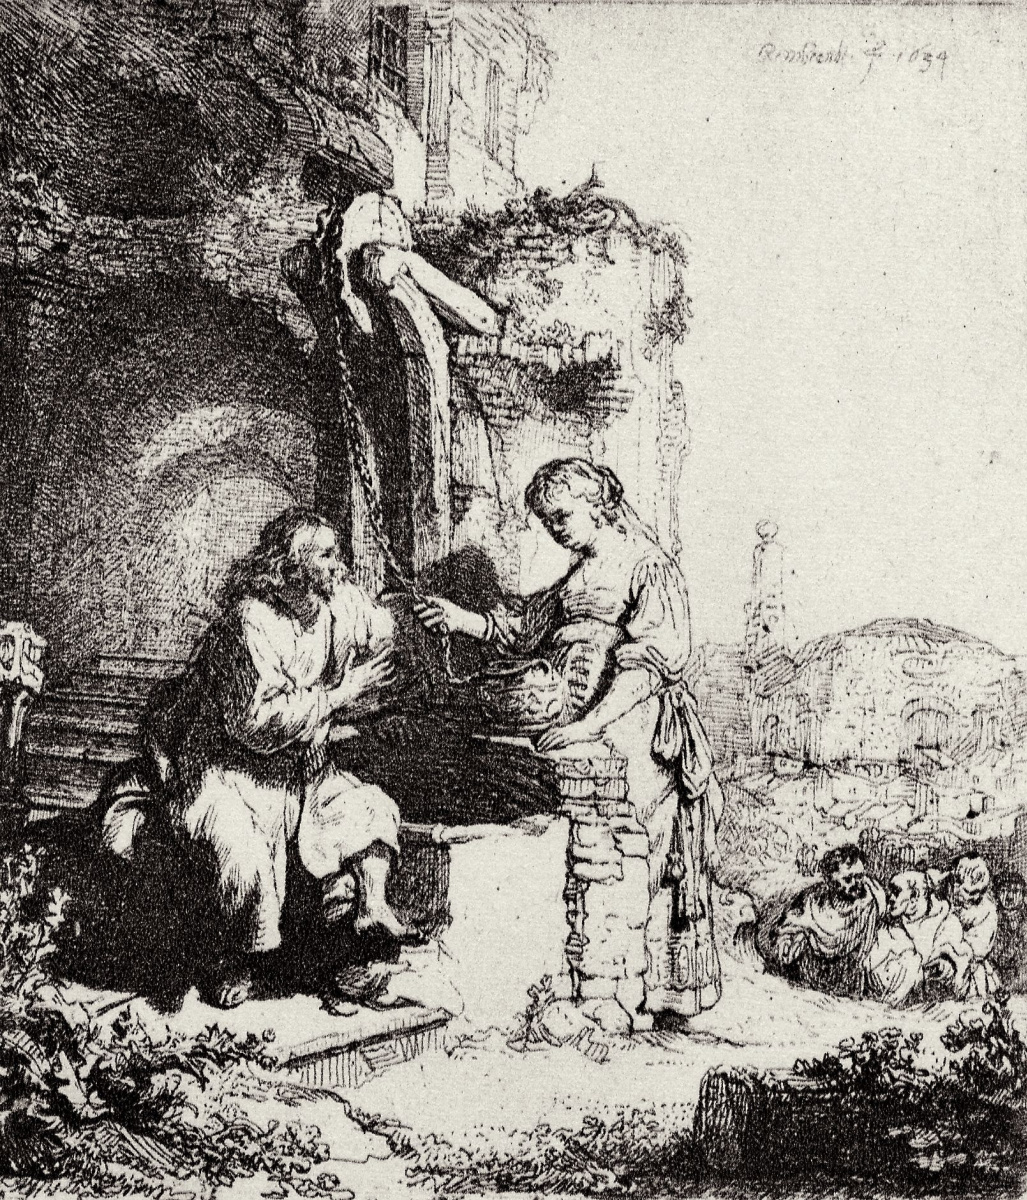 Рембрандт Харменс ван Рейн. Христос и самаритянка